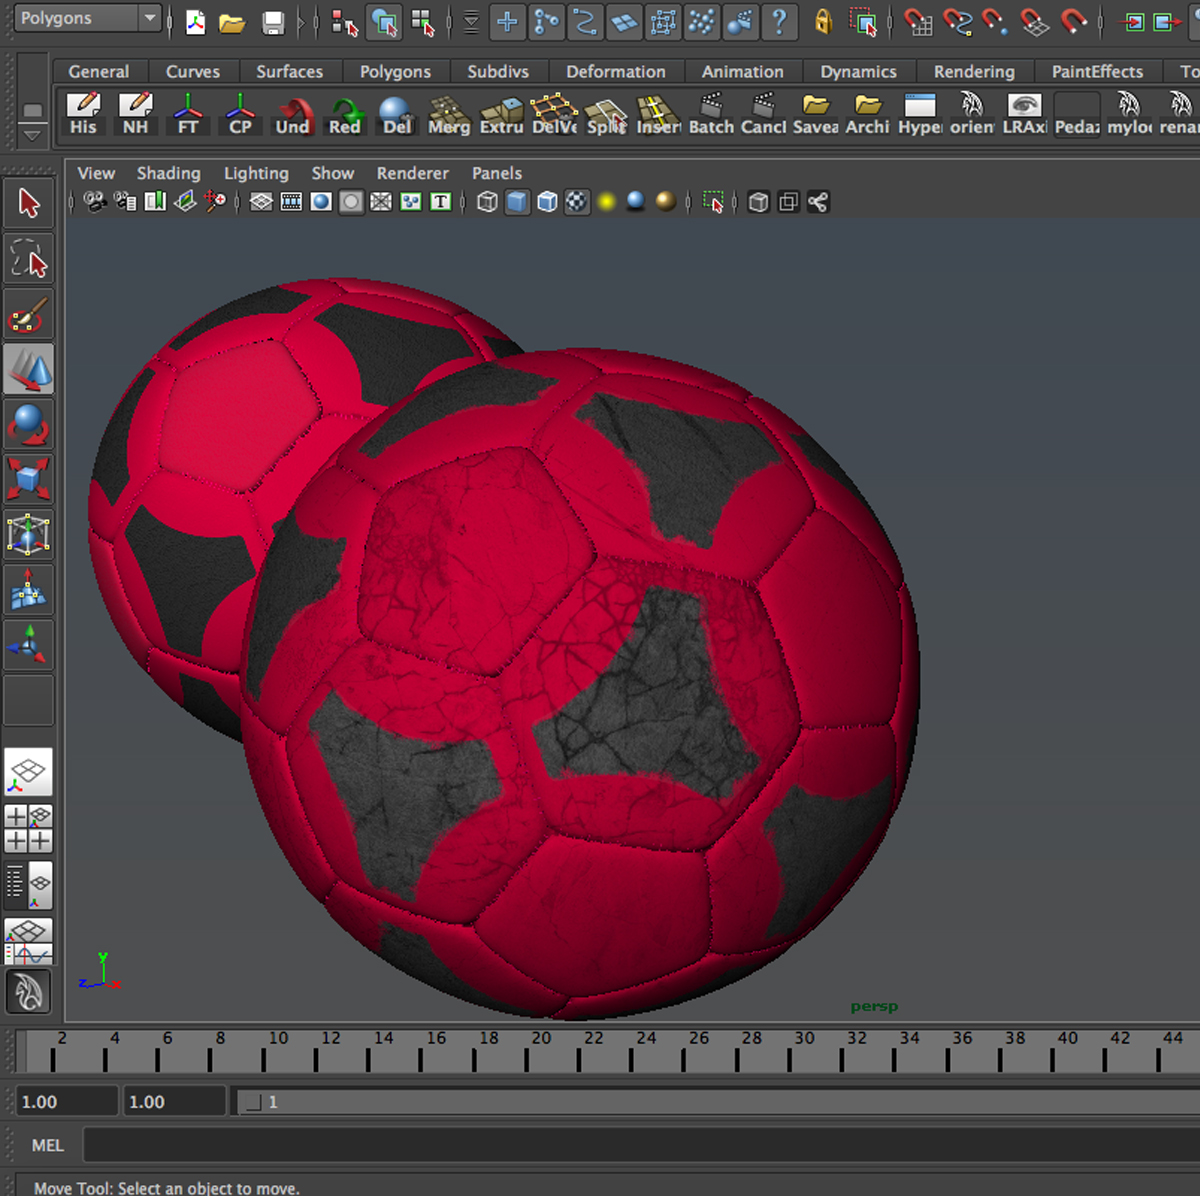 soccerball red black 3d model 3ds max fbx c4d ma mb obj 204557